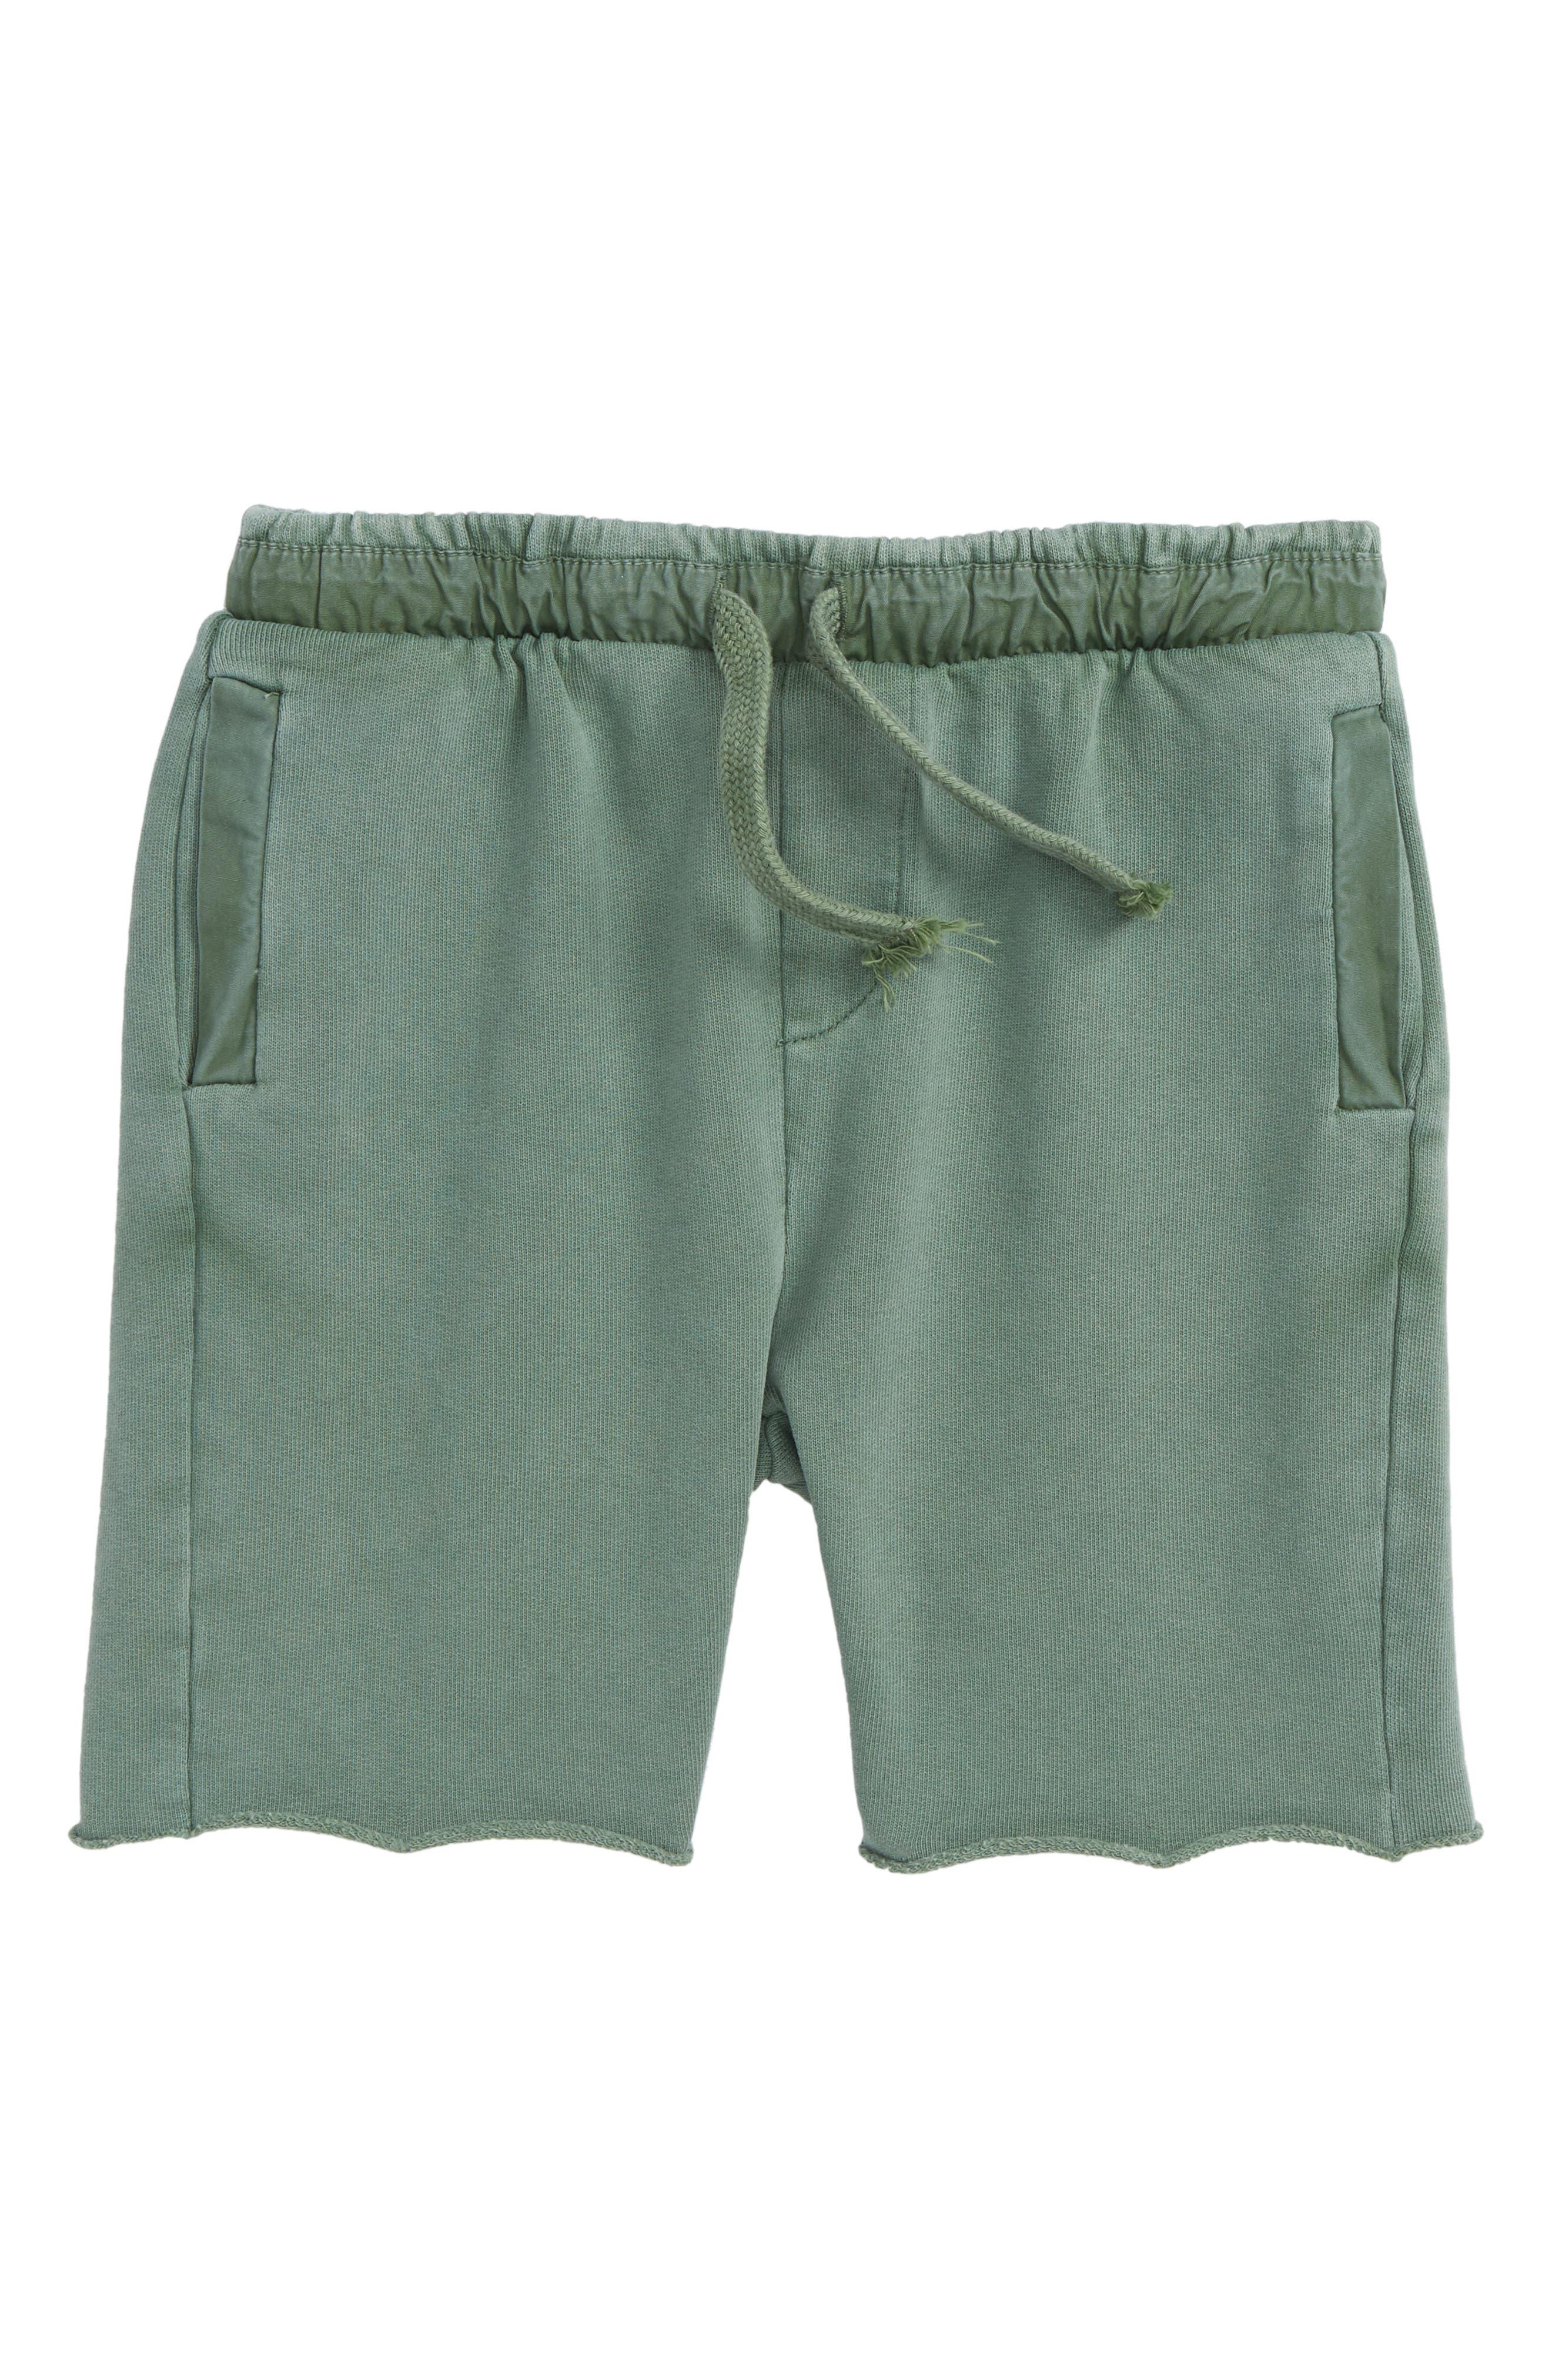 Kids Cullen Organic Cotton Shorts,                             Main thumbnail 1, color,